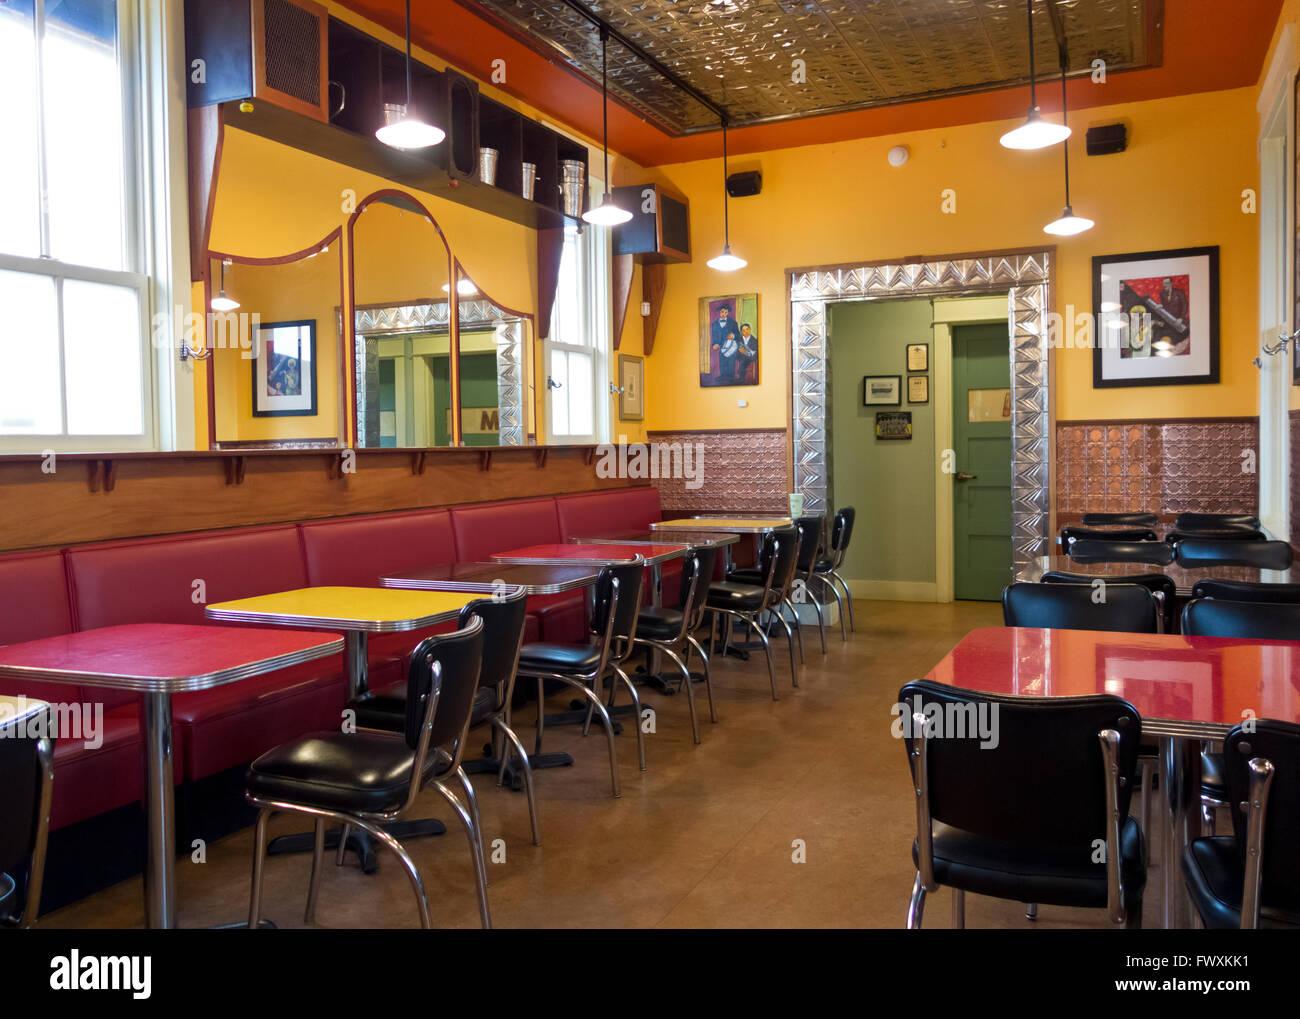 Retro Restaurant Interior : Retro diner like interior of the useless bay coffee